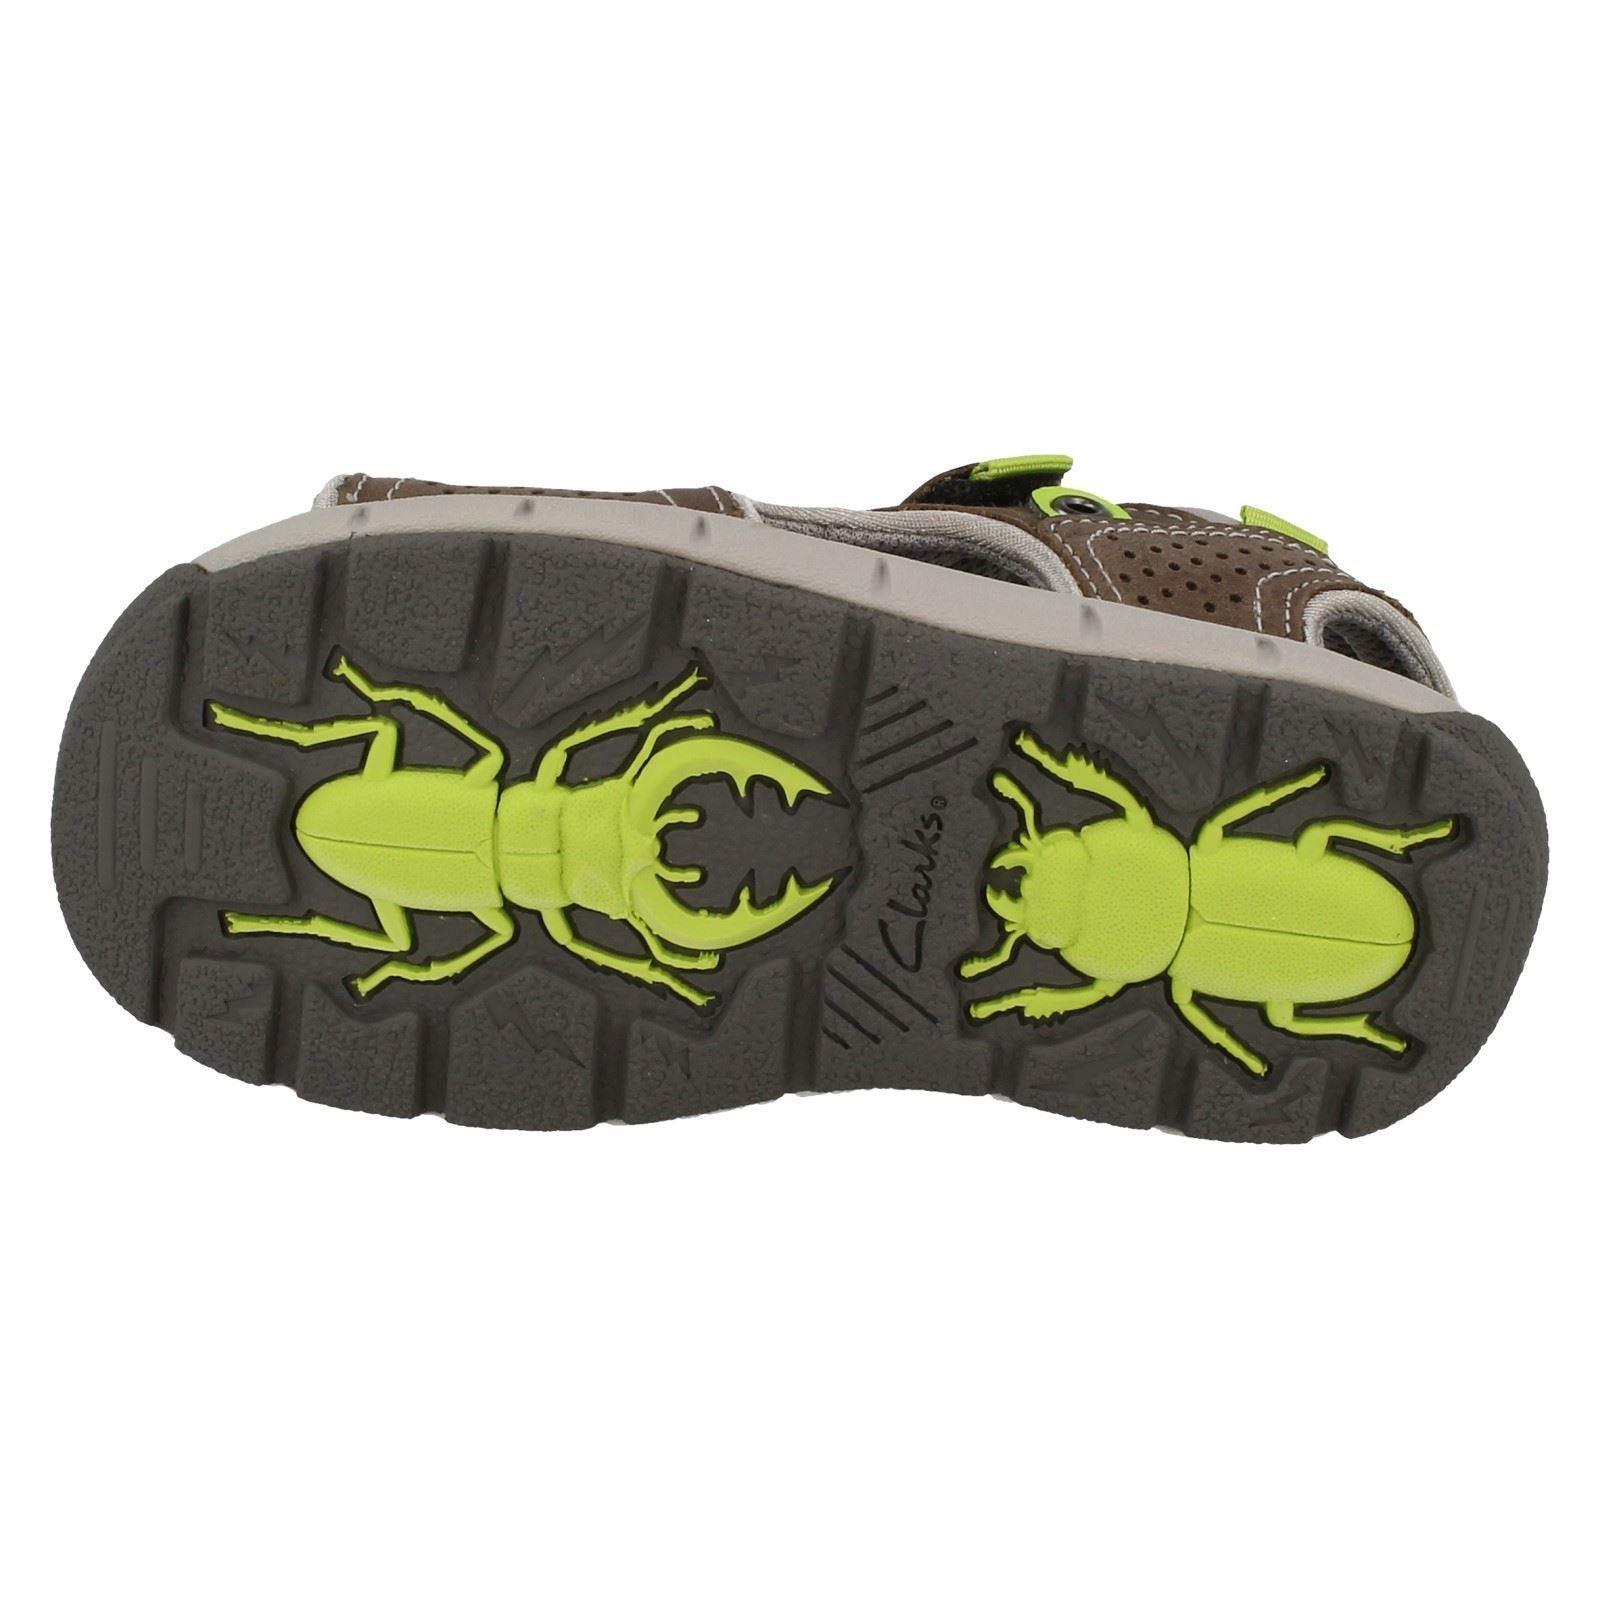 15f7a42f6b6 Infant//Junior Boys Clarks Jolly Wild Casual Summer Sandals